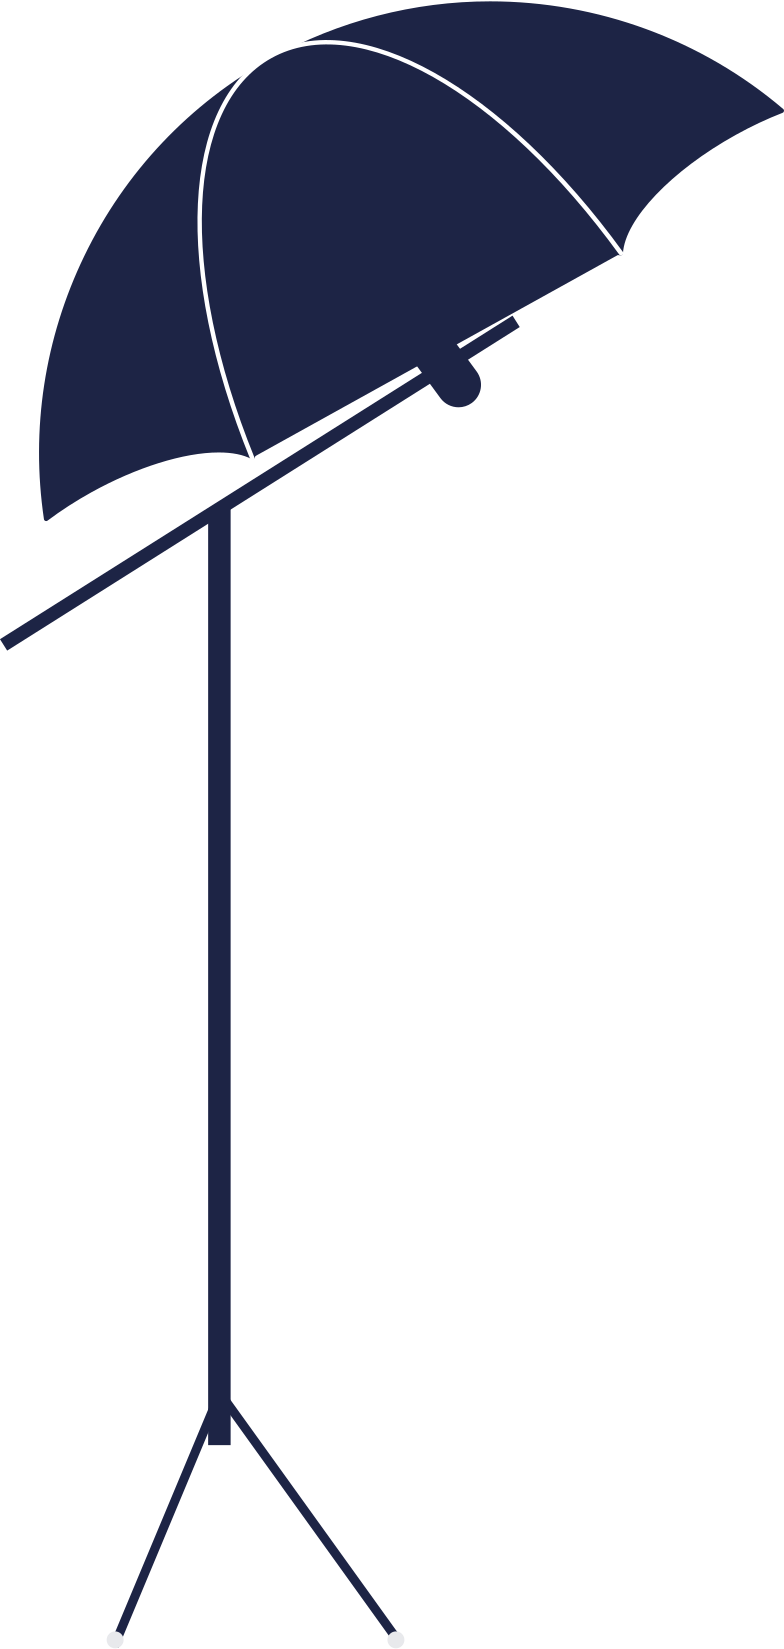 photostudio umbrella Clipart illustration in PNG, SVG